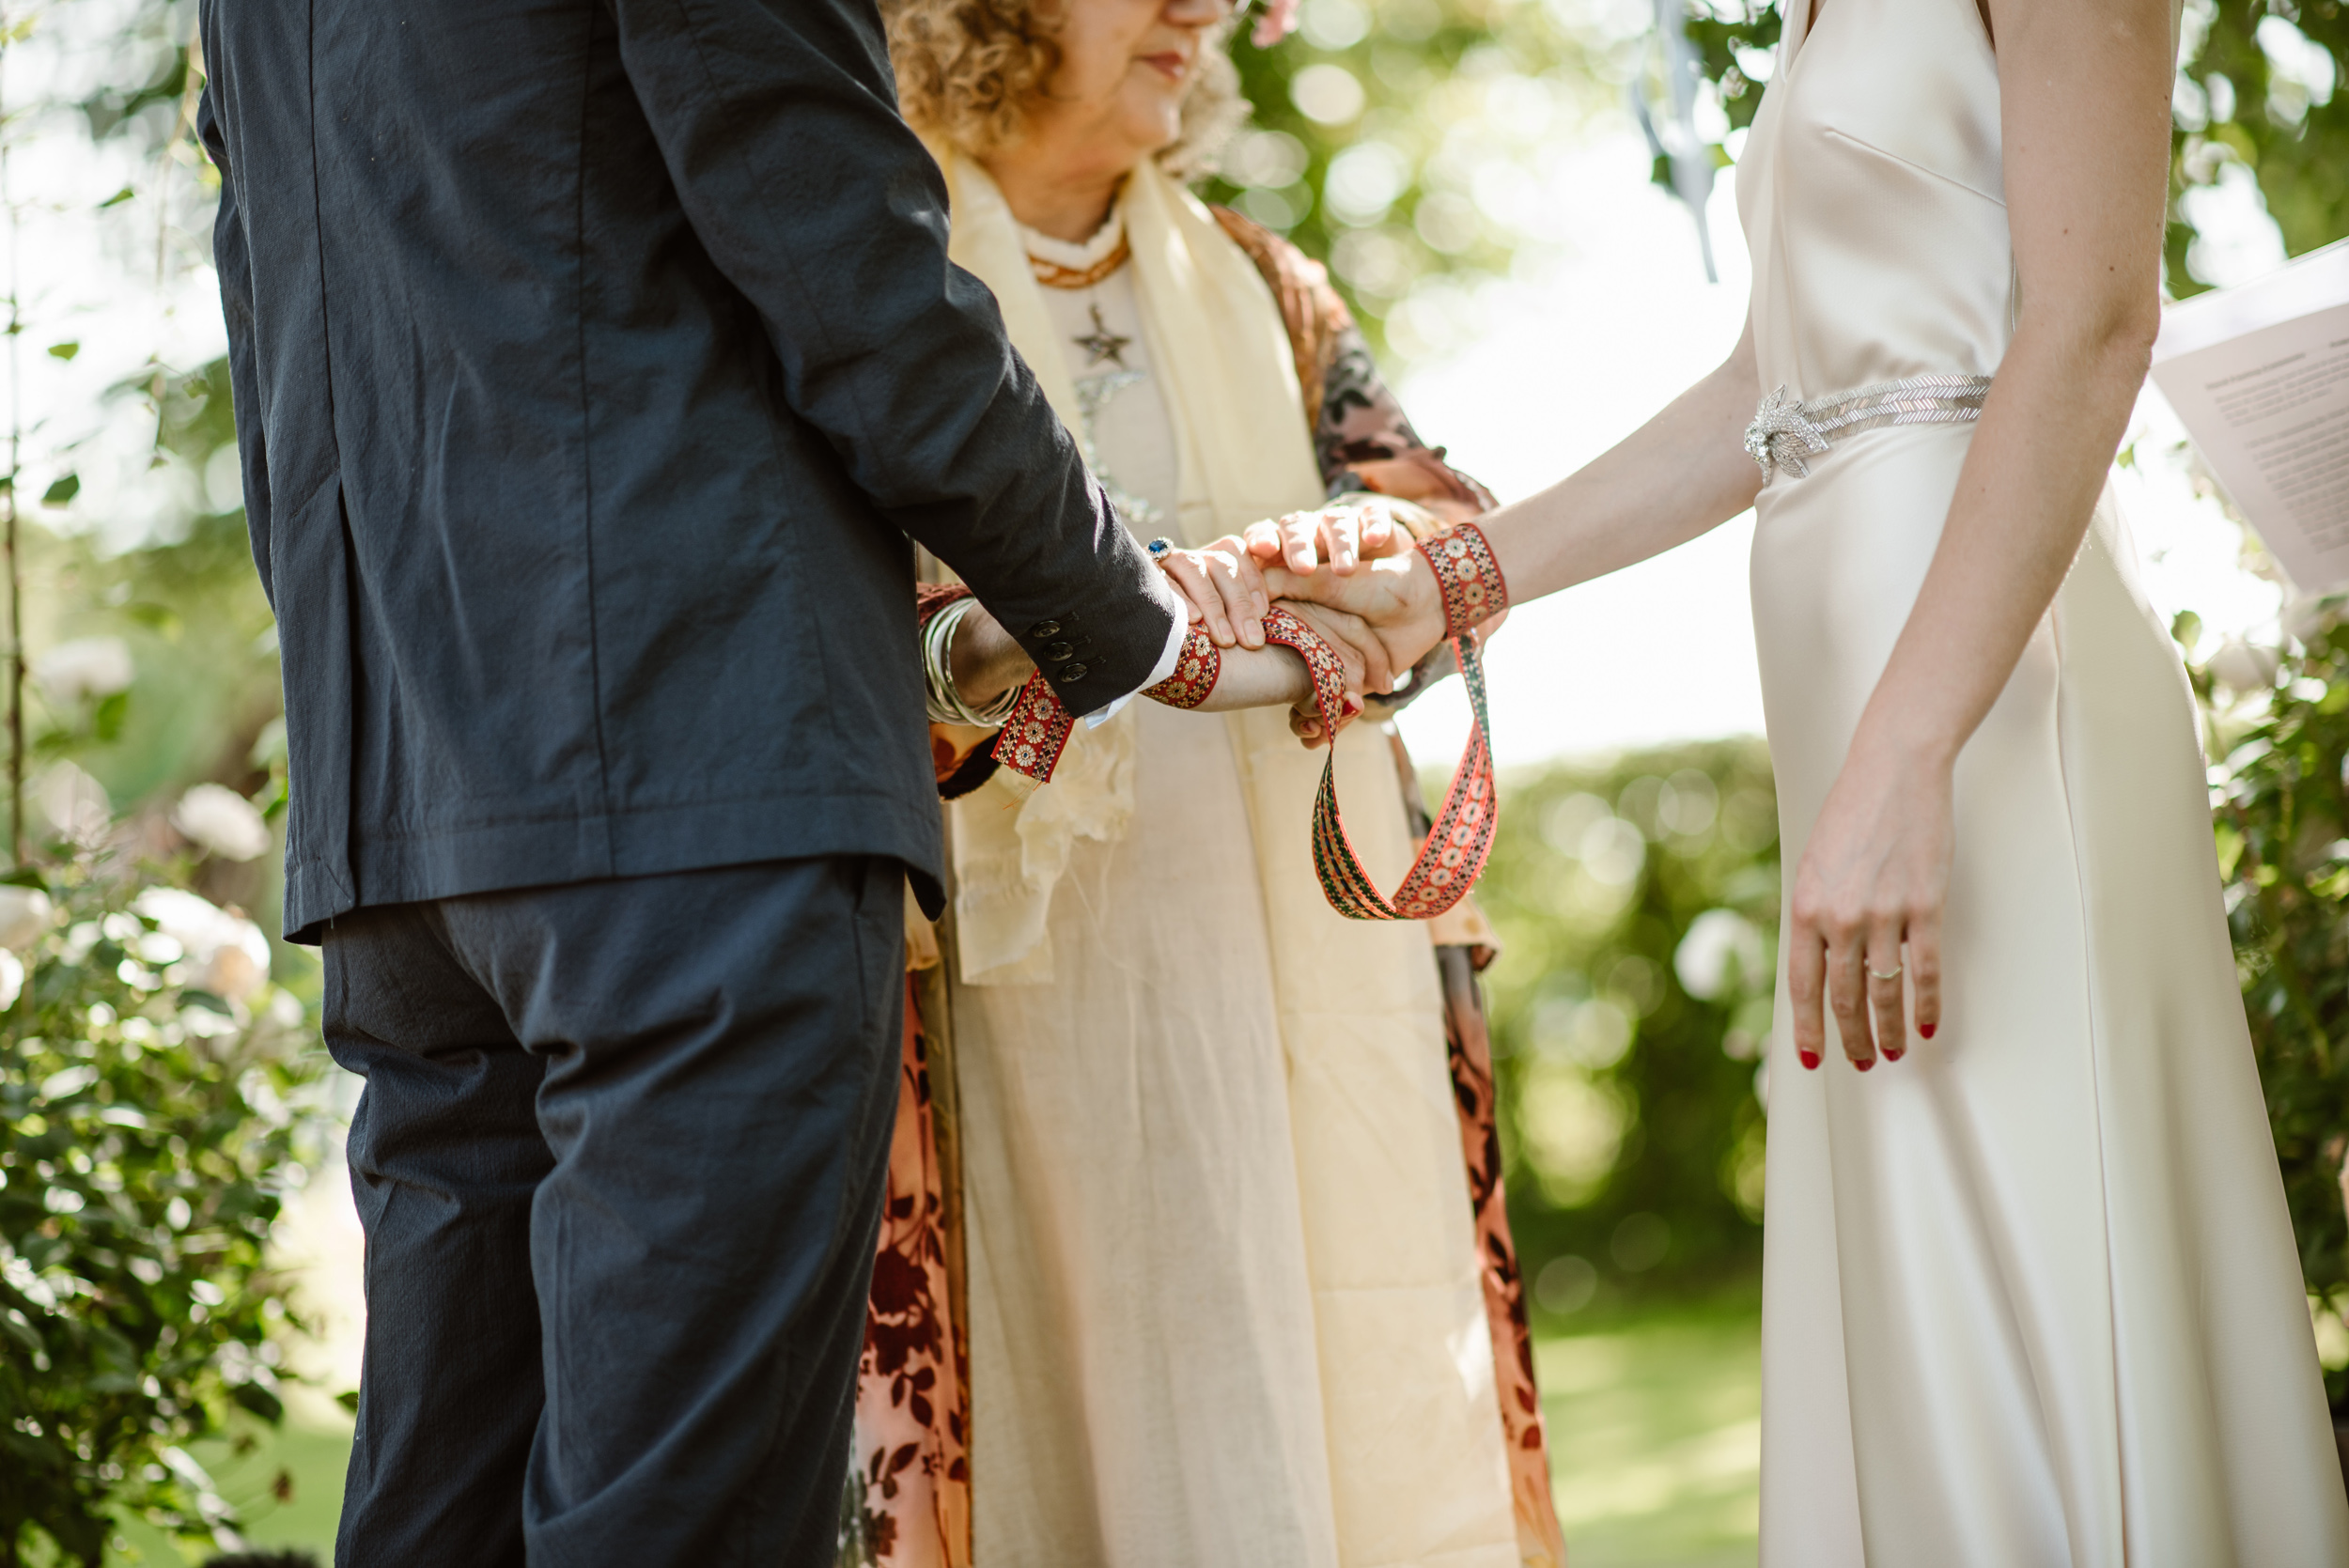 Ro-Kate-Beaumont-bias-cut-silk-wedding-gown-back-garden-wedding-by-Ellie-Gillard-7.jpg